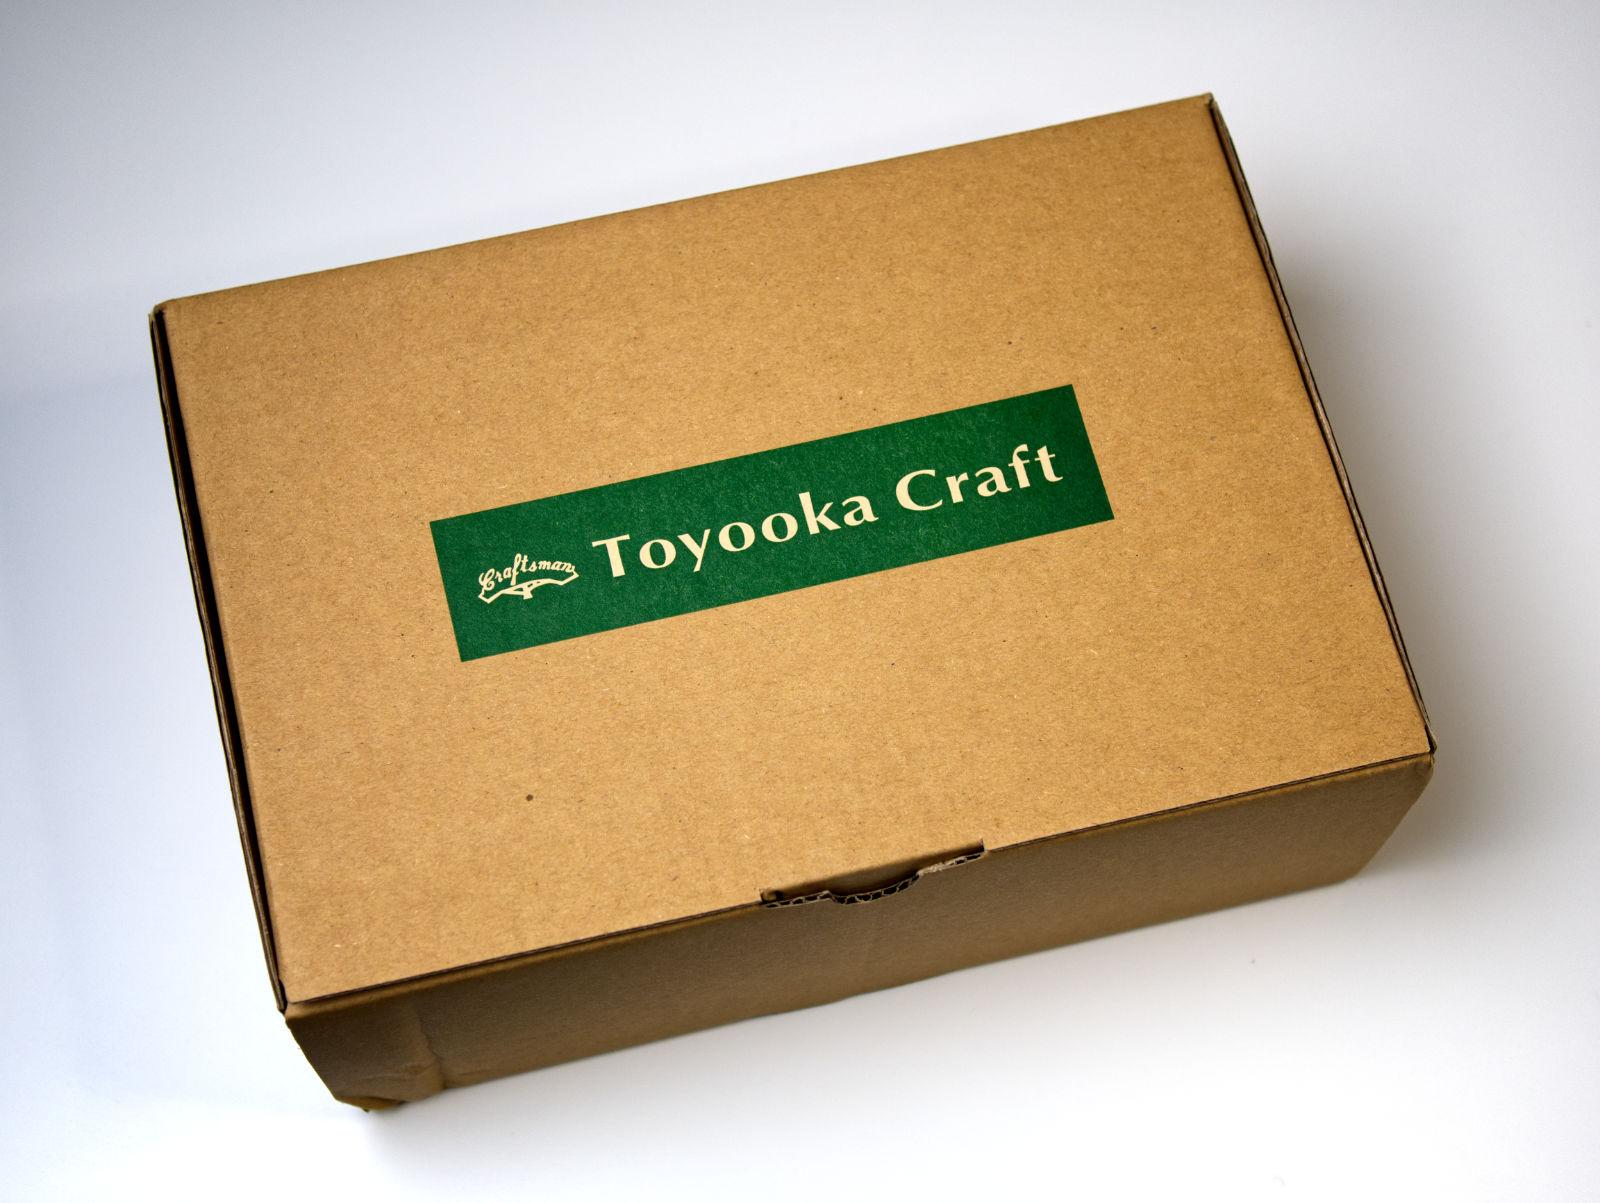 Toyooka Craft Watch Box Bubble Wrap